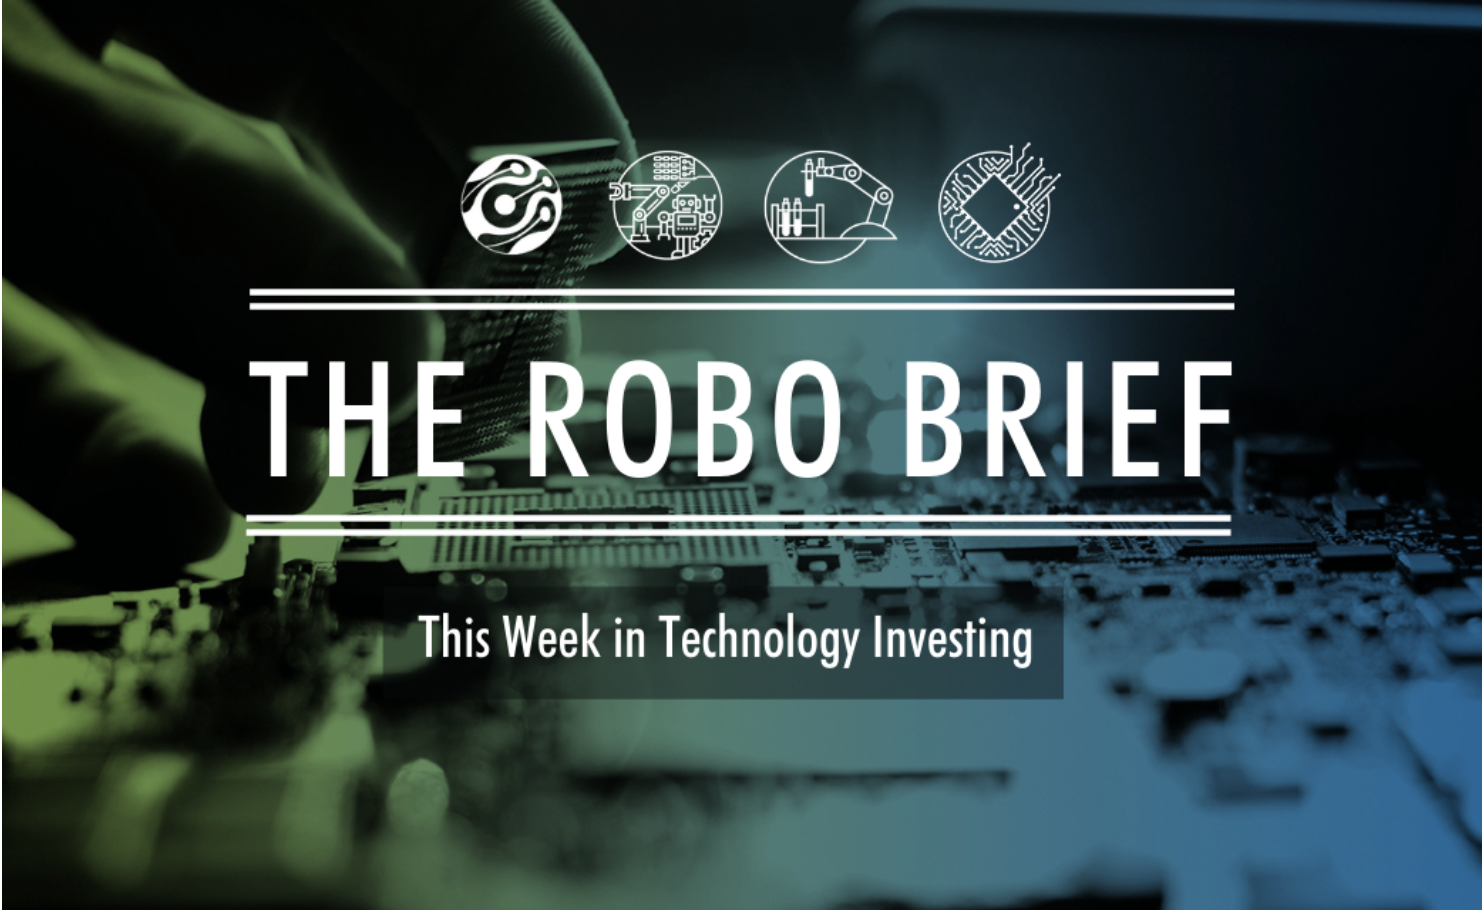 ROBO Brief: iRobot Soars, A Powerful AI Platform & New Diabetes Tech